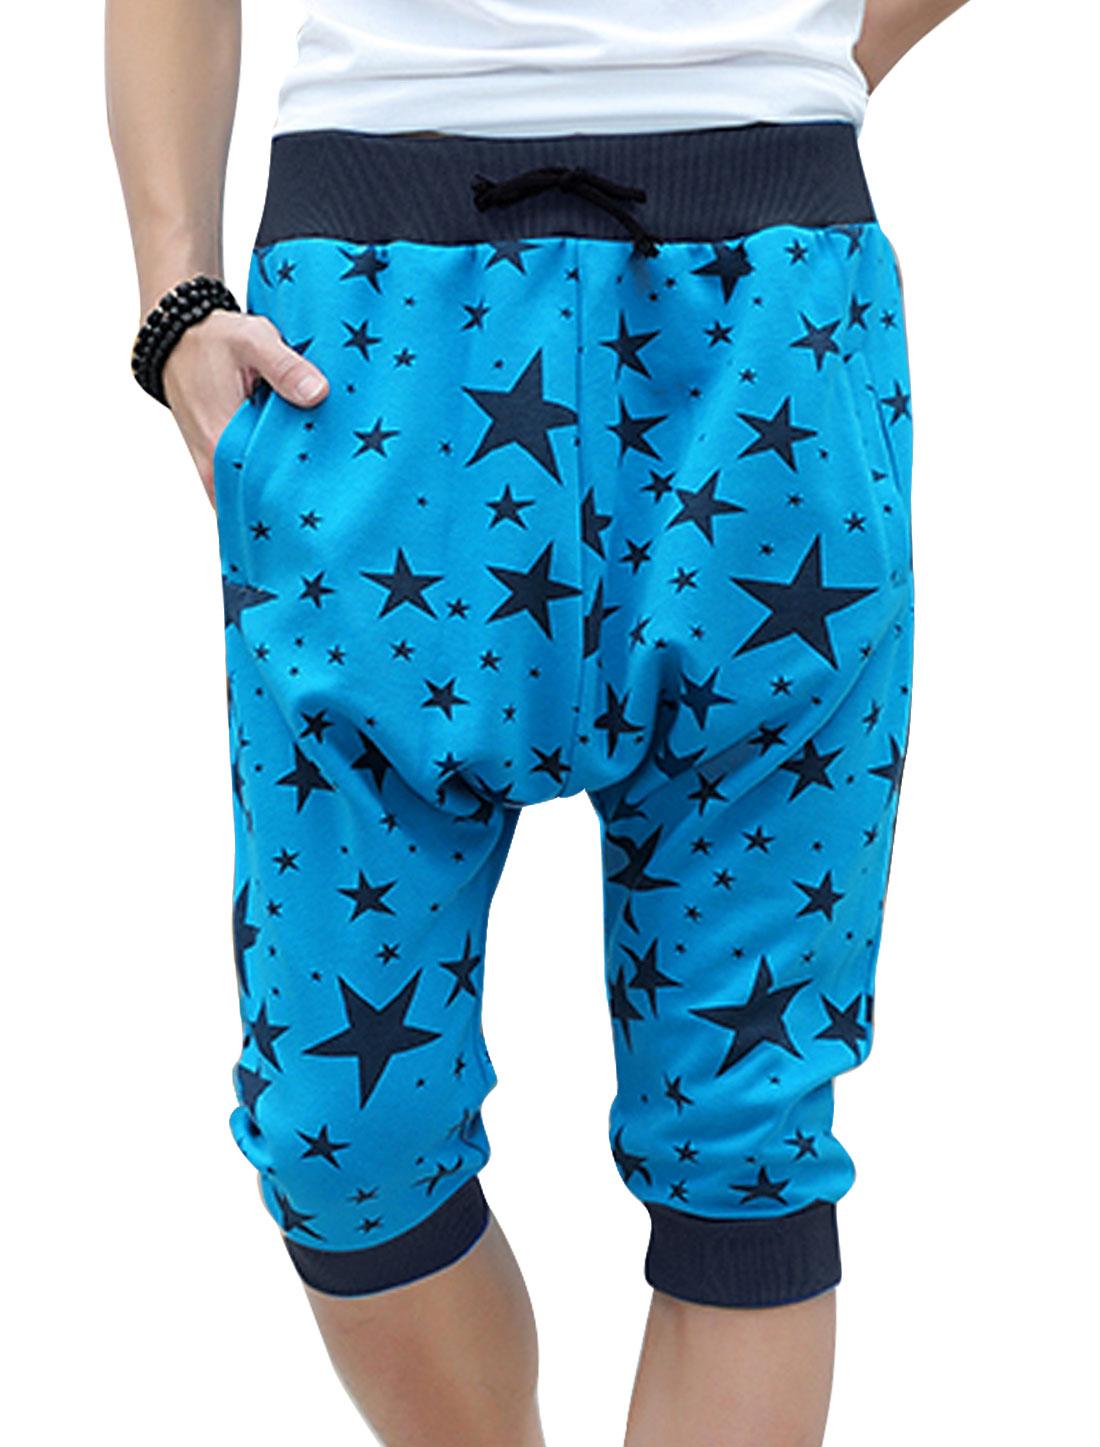 Men Two Pockets Back Ribbing Cuffs Chic Capris Harem Pants Light Blue W28